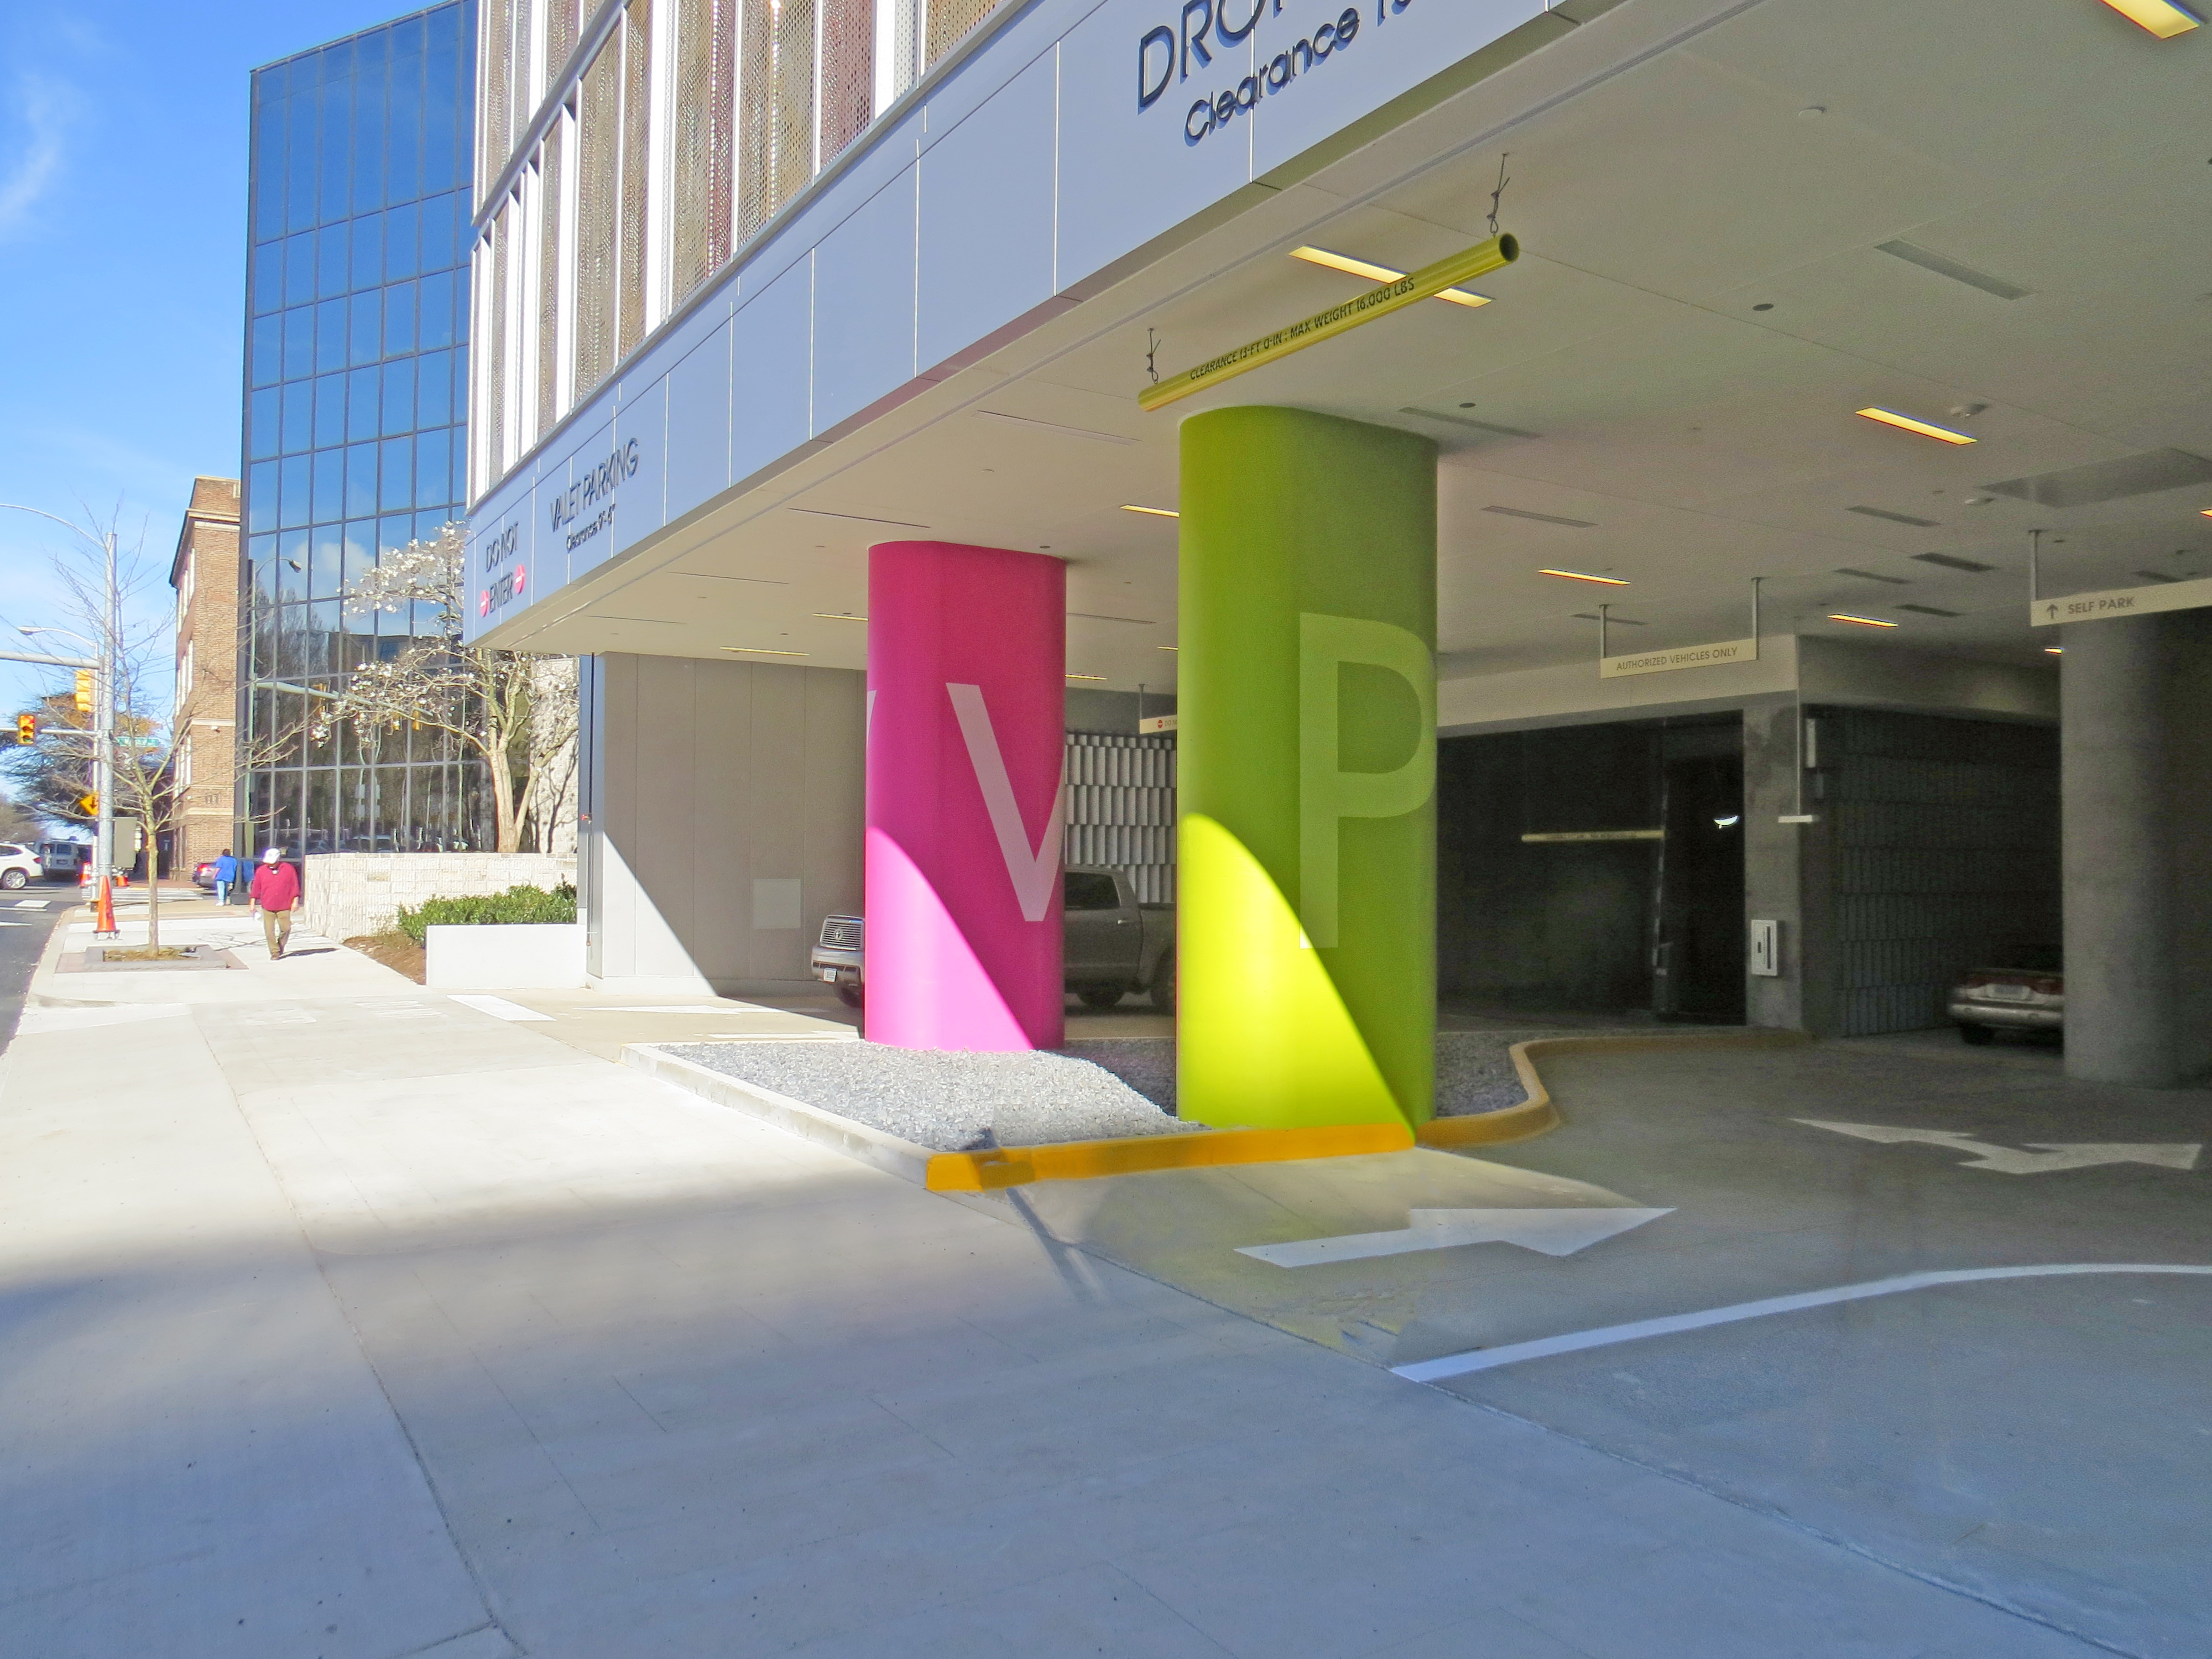 The Children's Hospital of Richmond Pavilion at VCU Wins Top